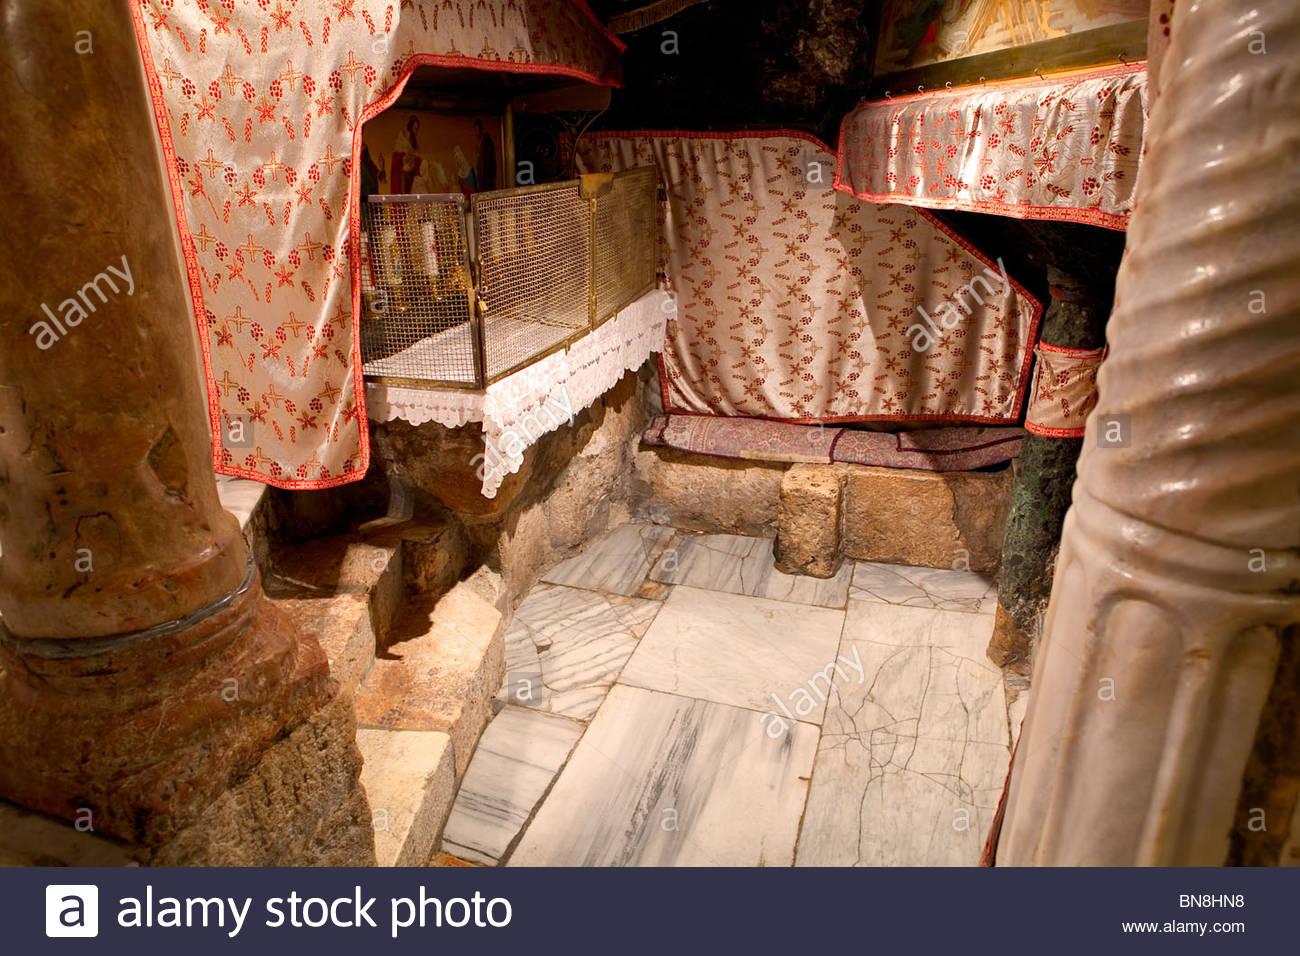 Bethlehem The Altar Of The Adoration Of The Magi Inside